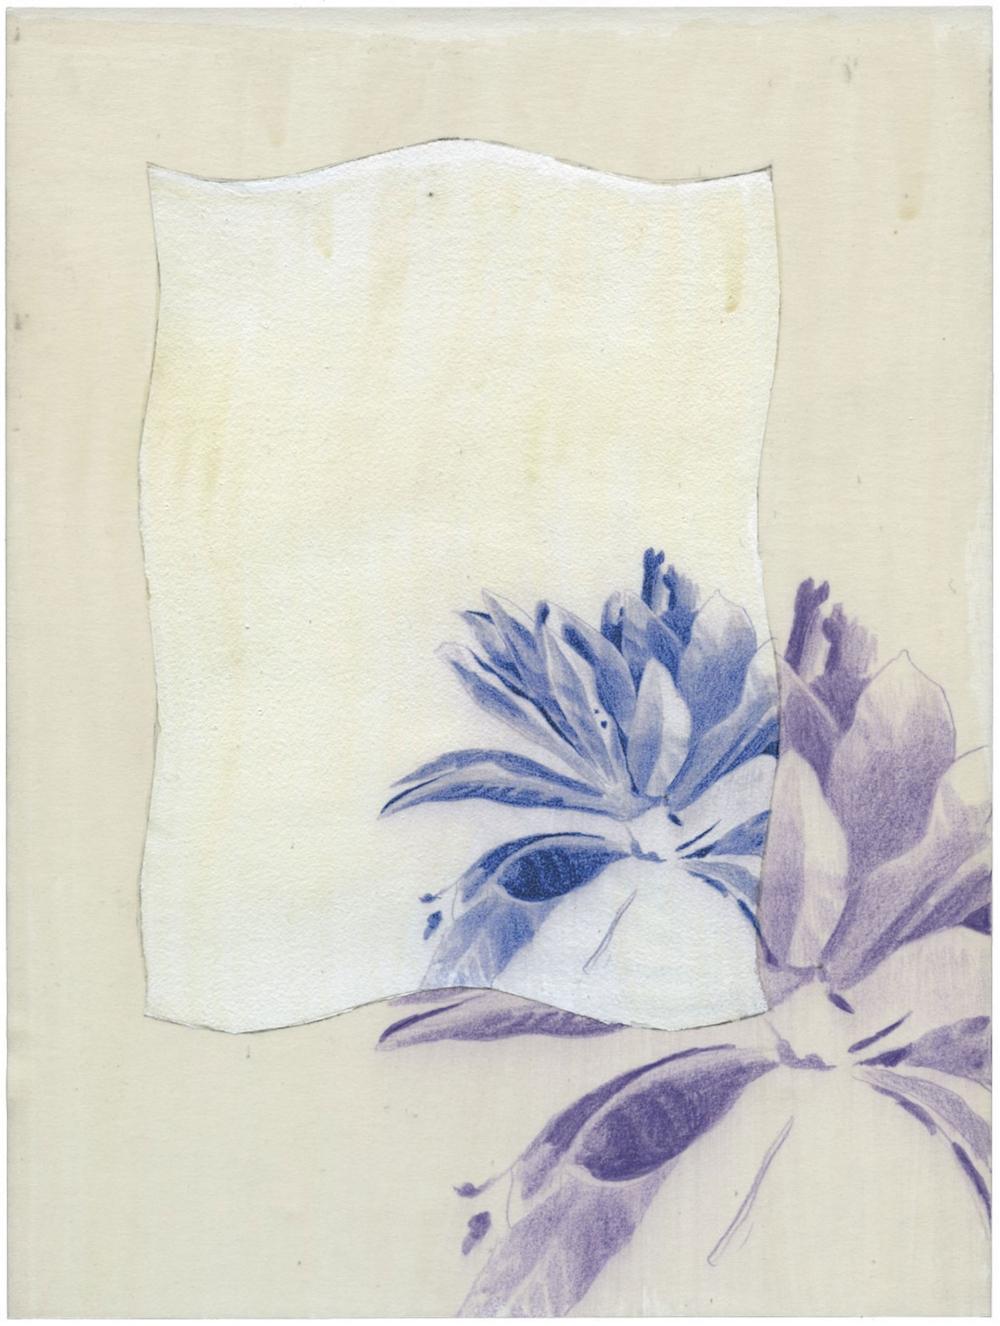 Jonah Gebka, o.T., Buntstift, Acrylharz, Acryl und Tintenstrahldruck auf Papier, 29 x 21 cm, 2017.jpeg